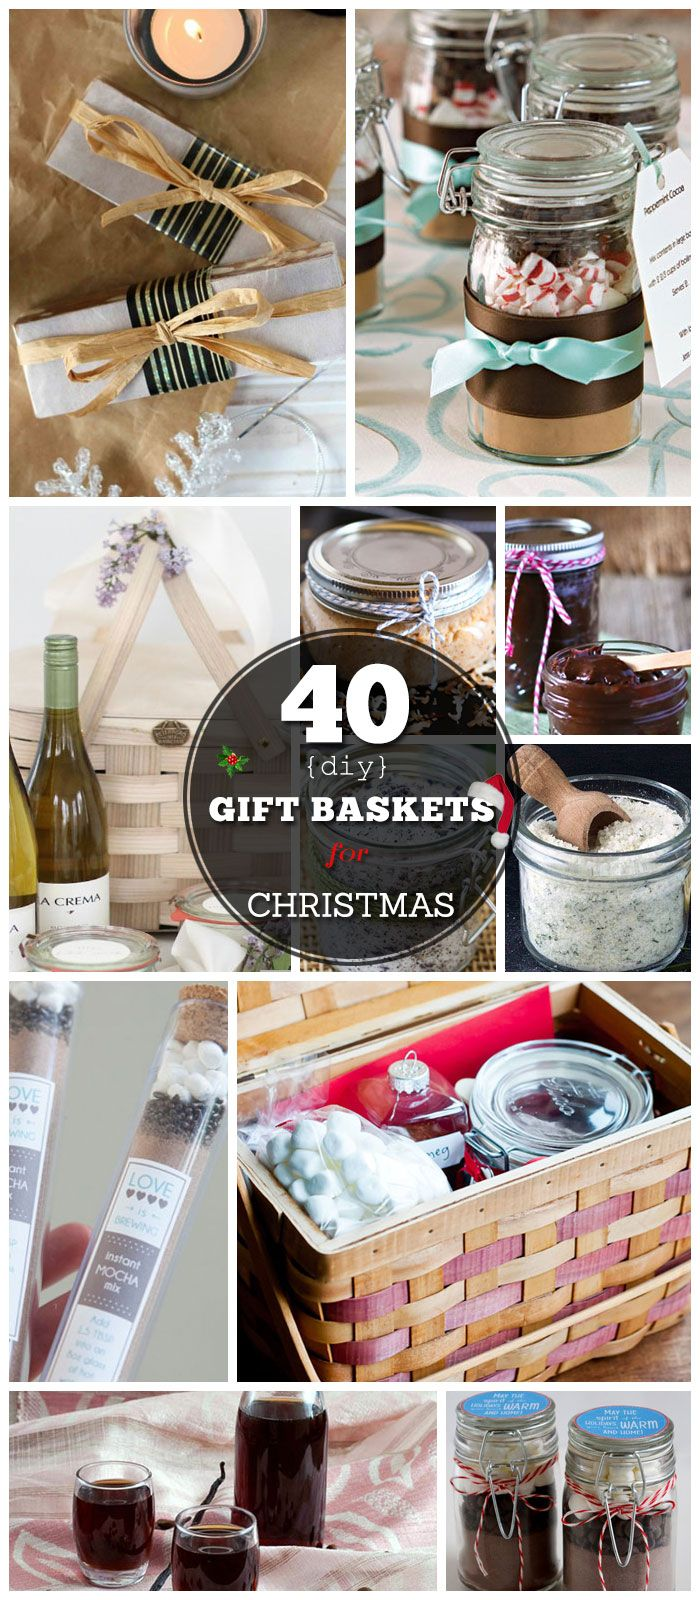 40 DIY Gift Basket Ideas for Christmas | Handmade Gift Ideas for Christmas